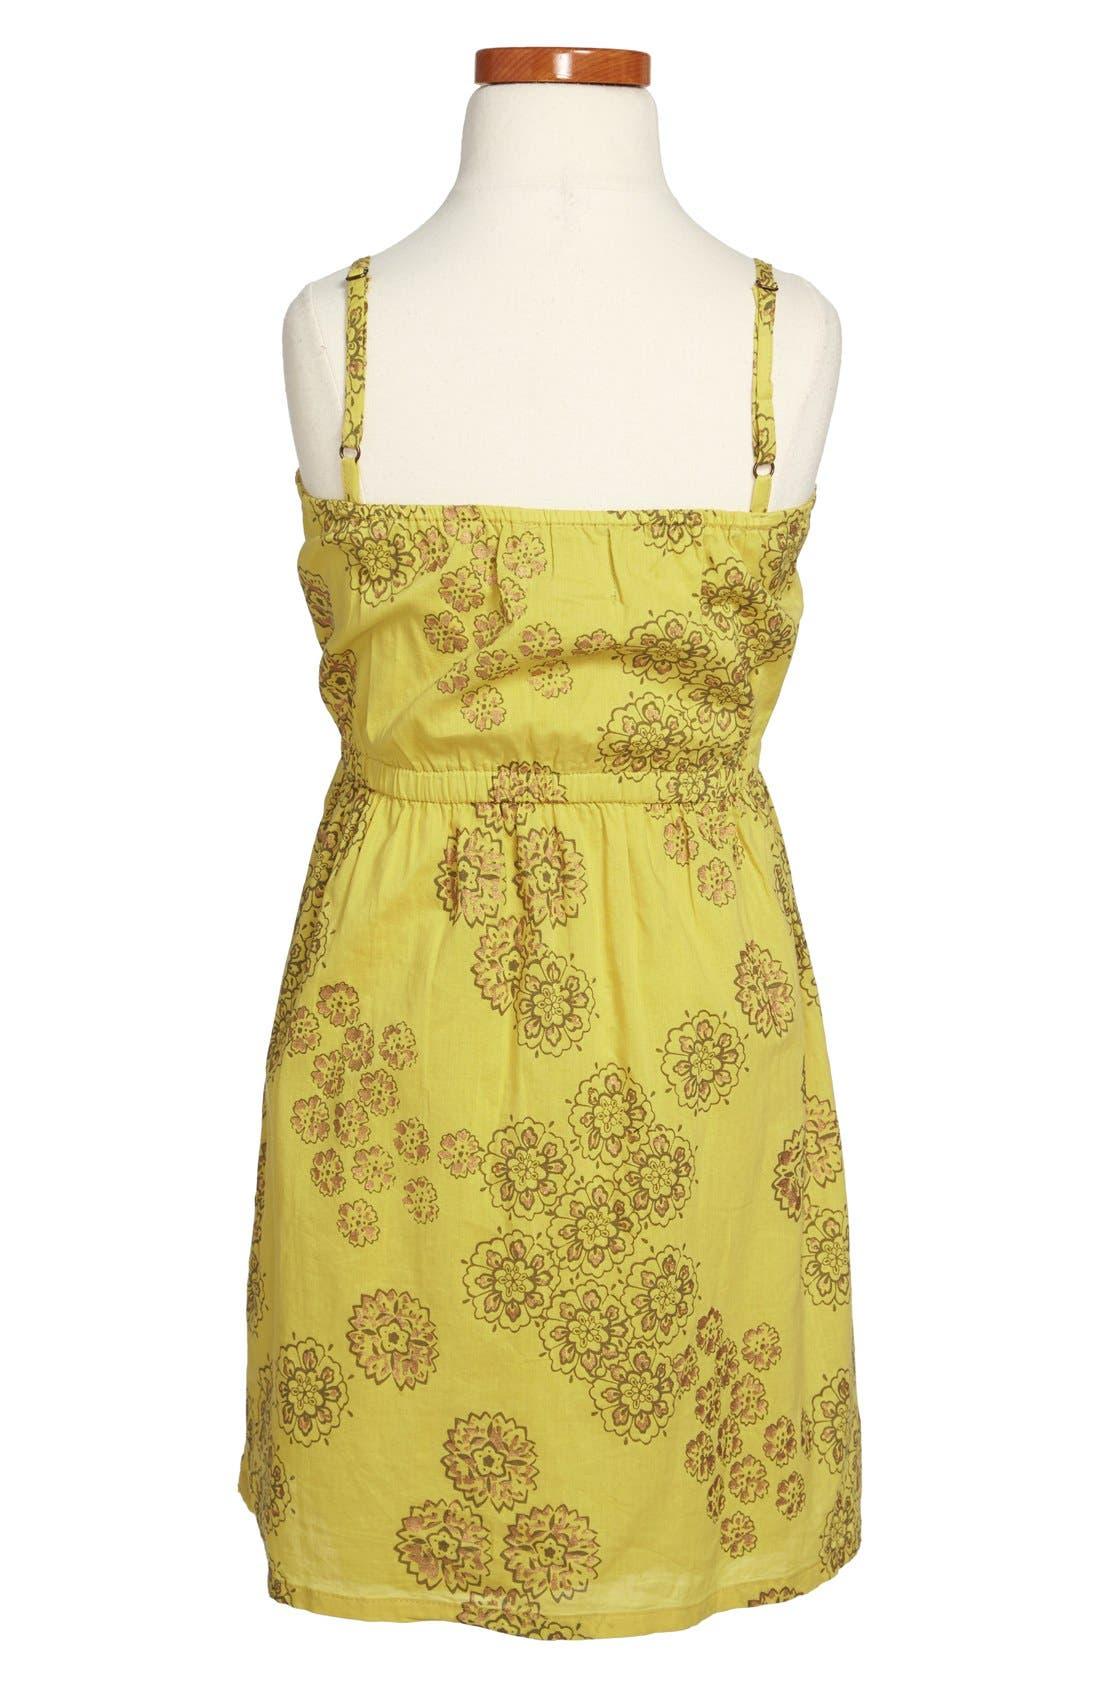 Alternate Image 2  - Peek 'Violet' Cotton Sundress (Toddler Girls, Little Girls & Big Girls)